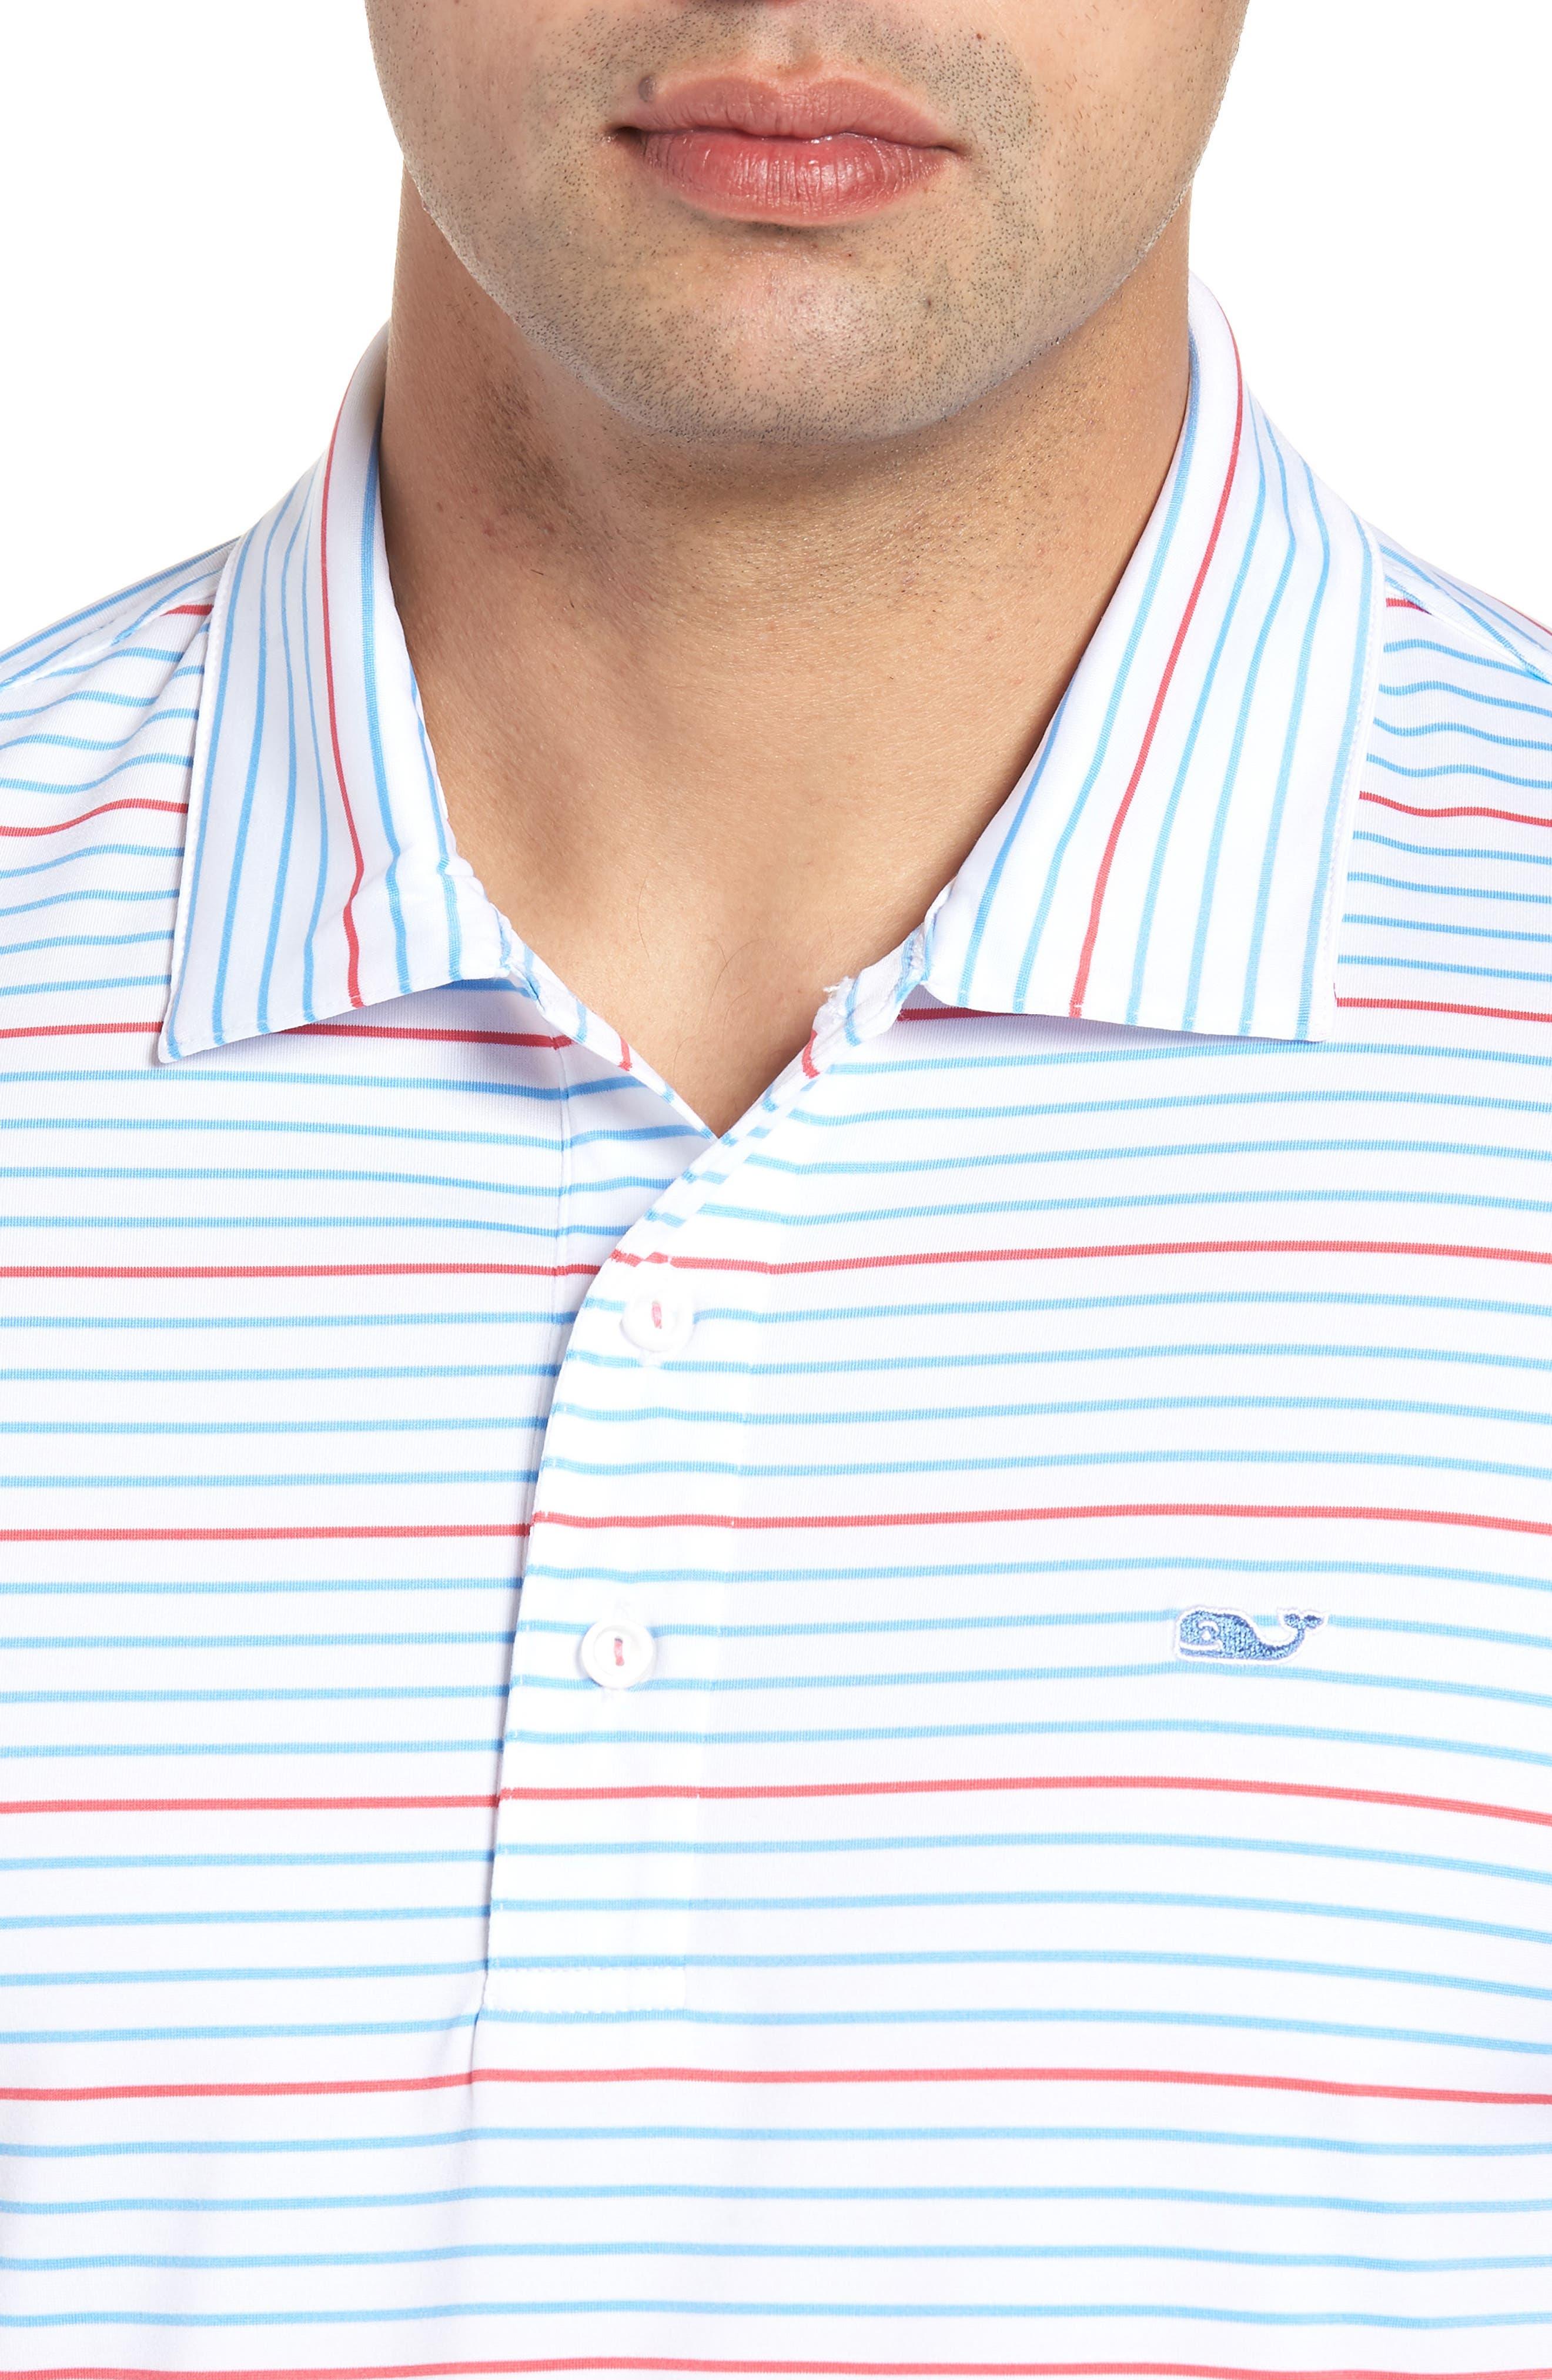 Swindell Stretch Stripe Polo,                             Alternate thumbnail 4, color,                             White Cap